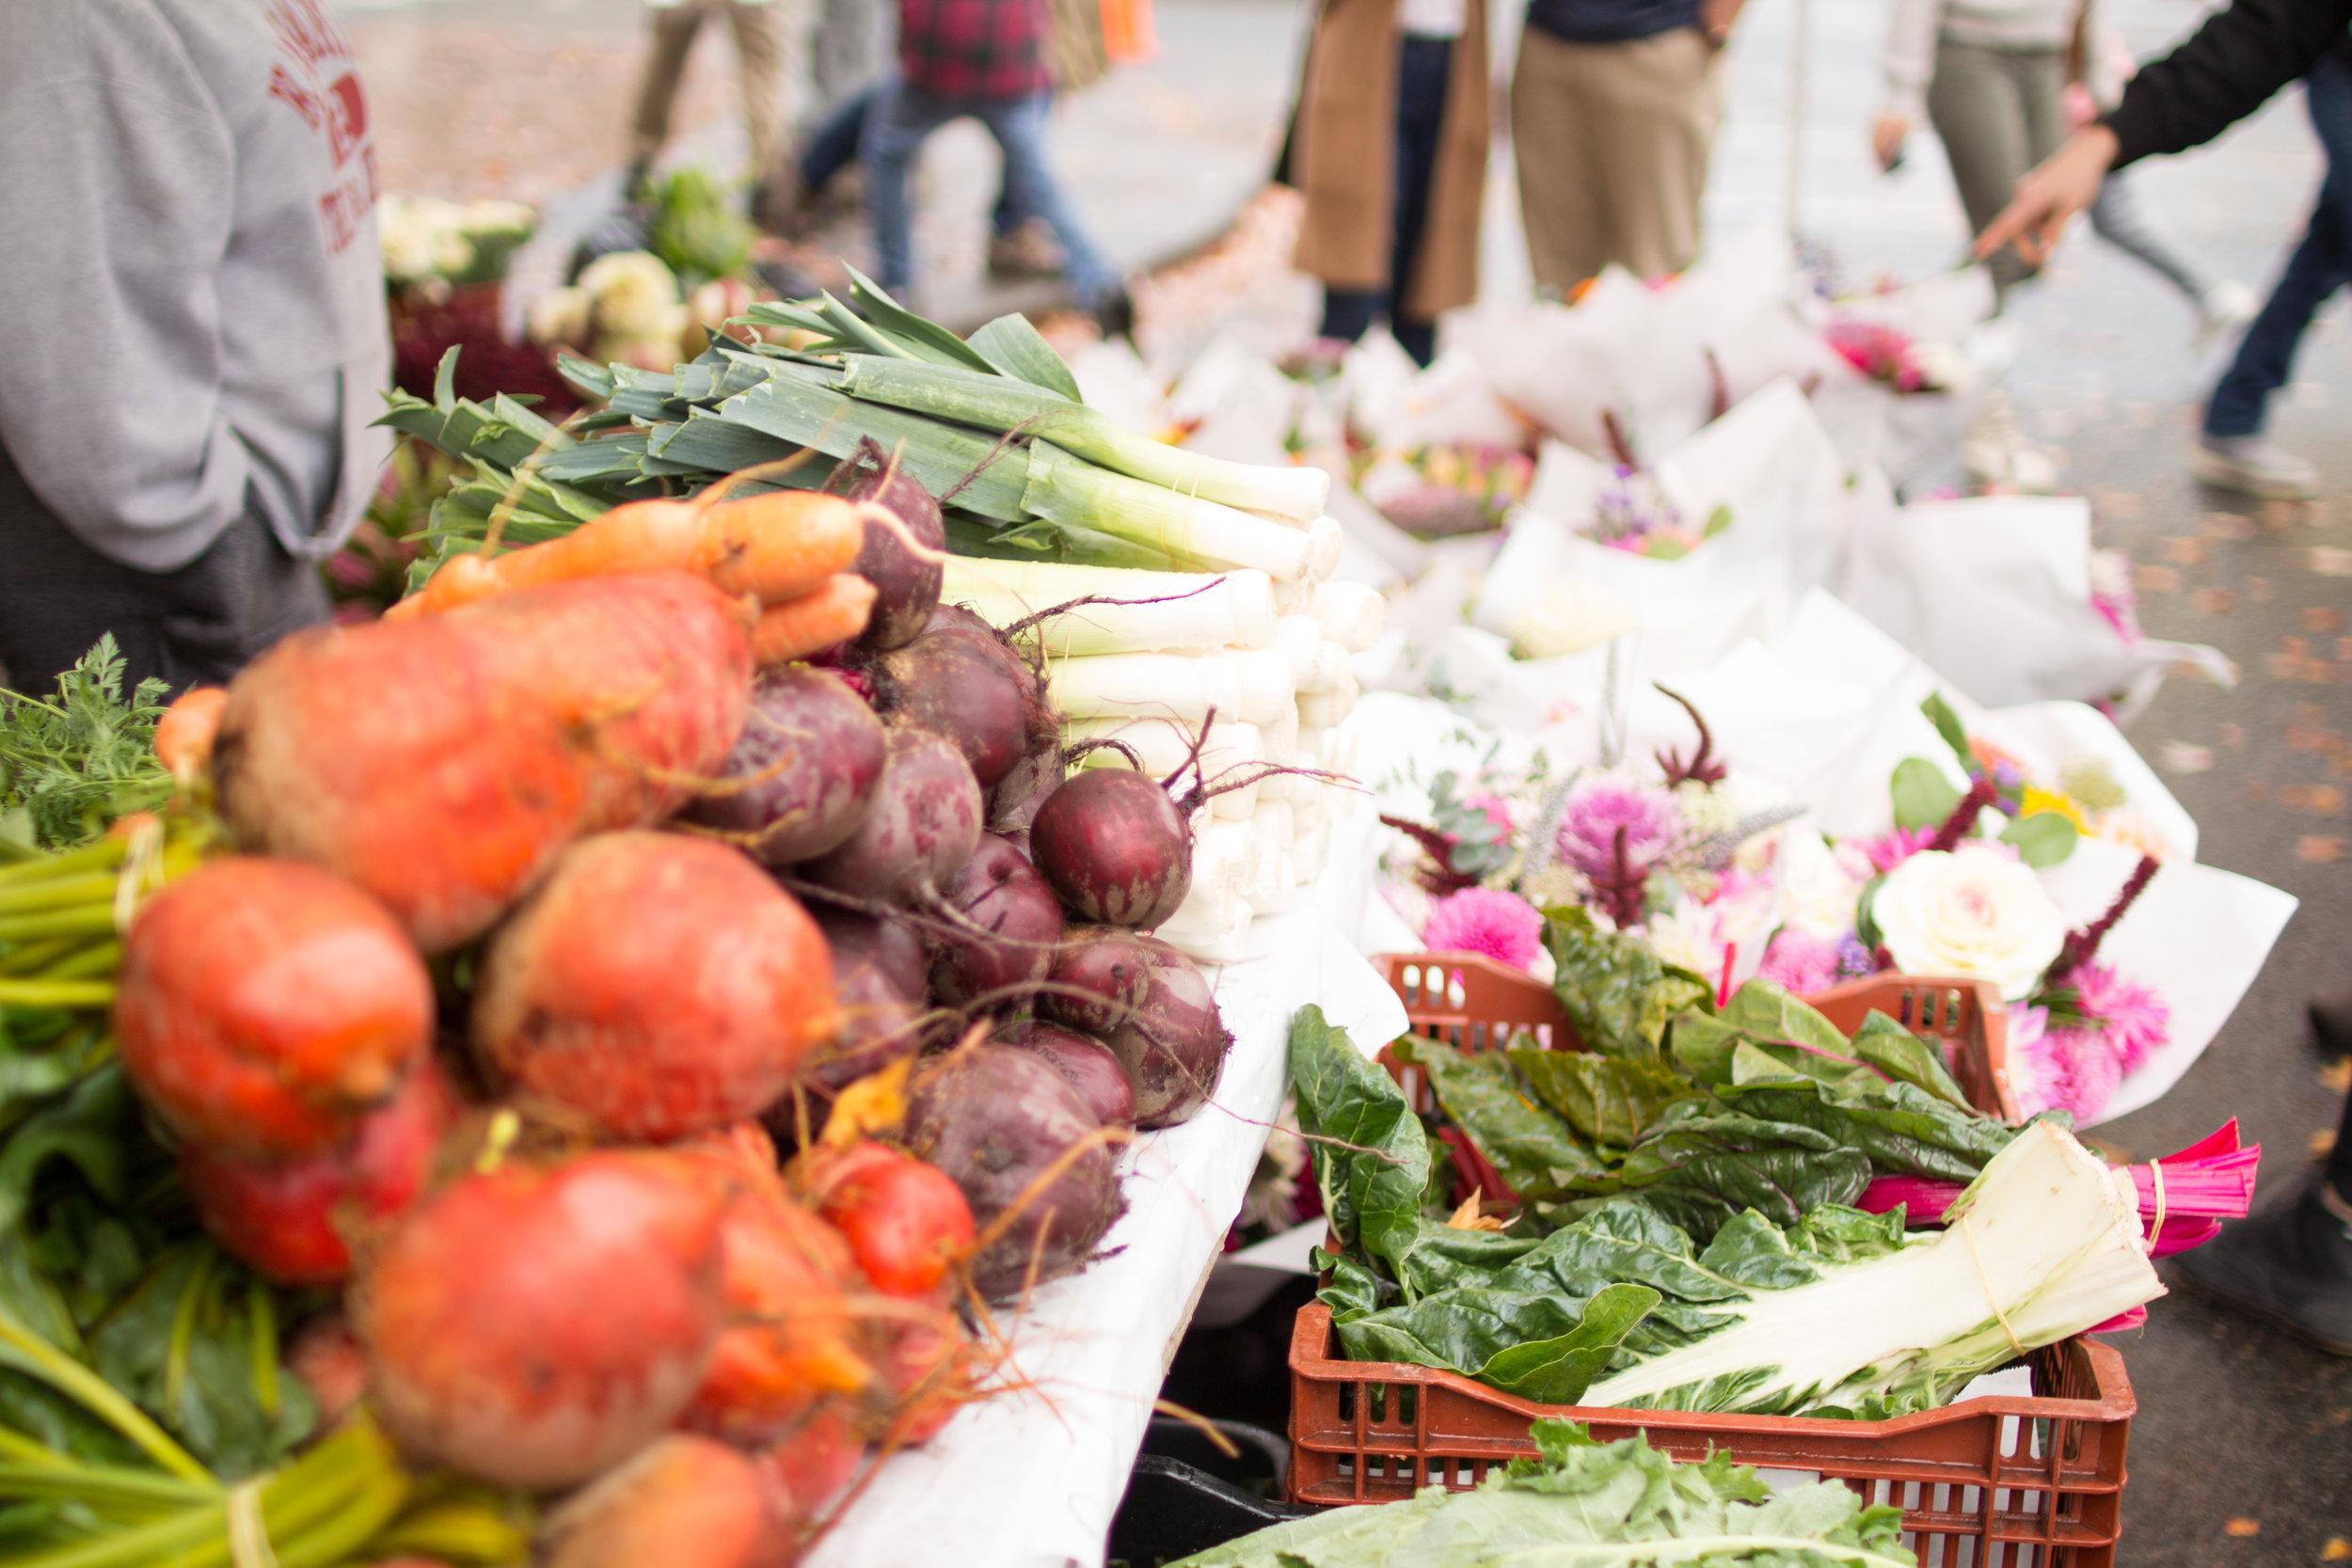 Farm fresh produce at the Ballard Farmers Market